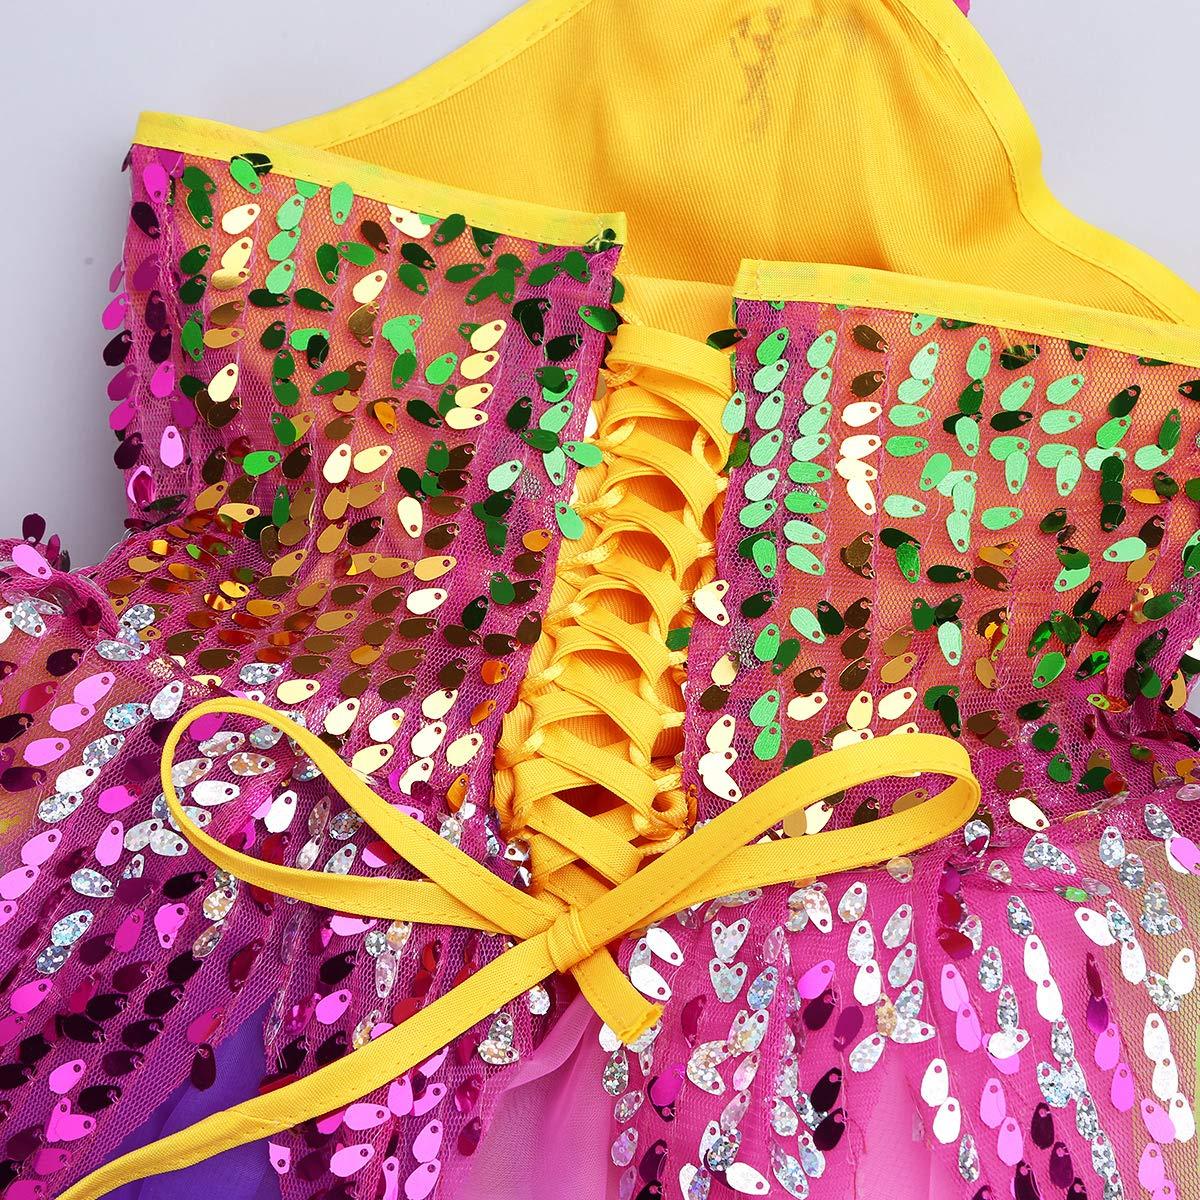 IEFIEL Disfraz Bailarina Ni/ña Lentejuelas Fiesta Vestido de Danza Flores Traje de Ballet Princesa Maillot Tut/ú Ropa para Baile Actuaci/ón Competici/ón Rosa